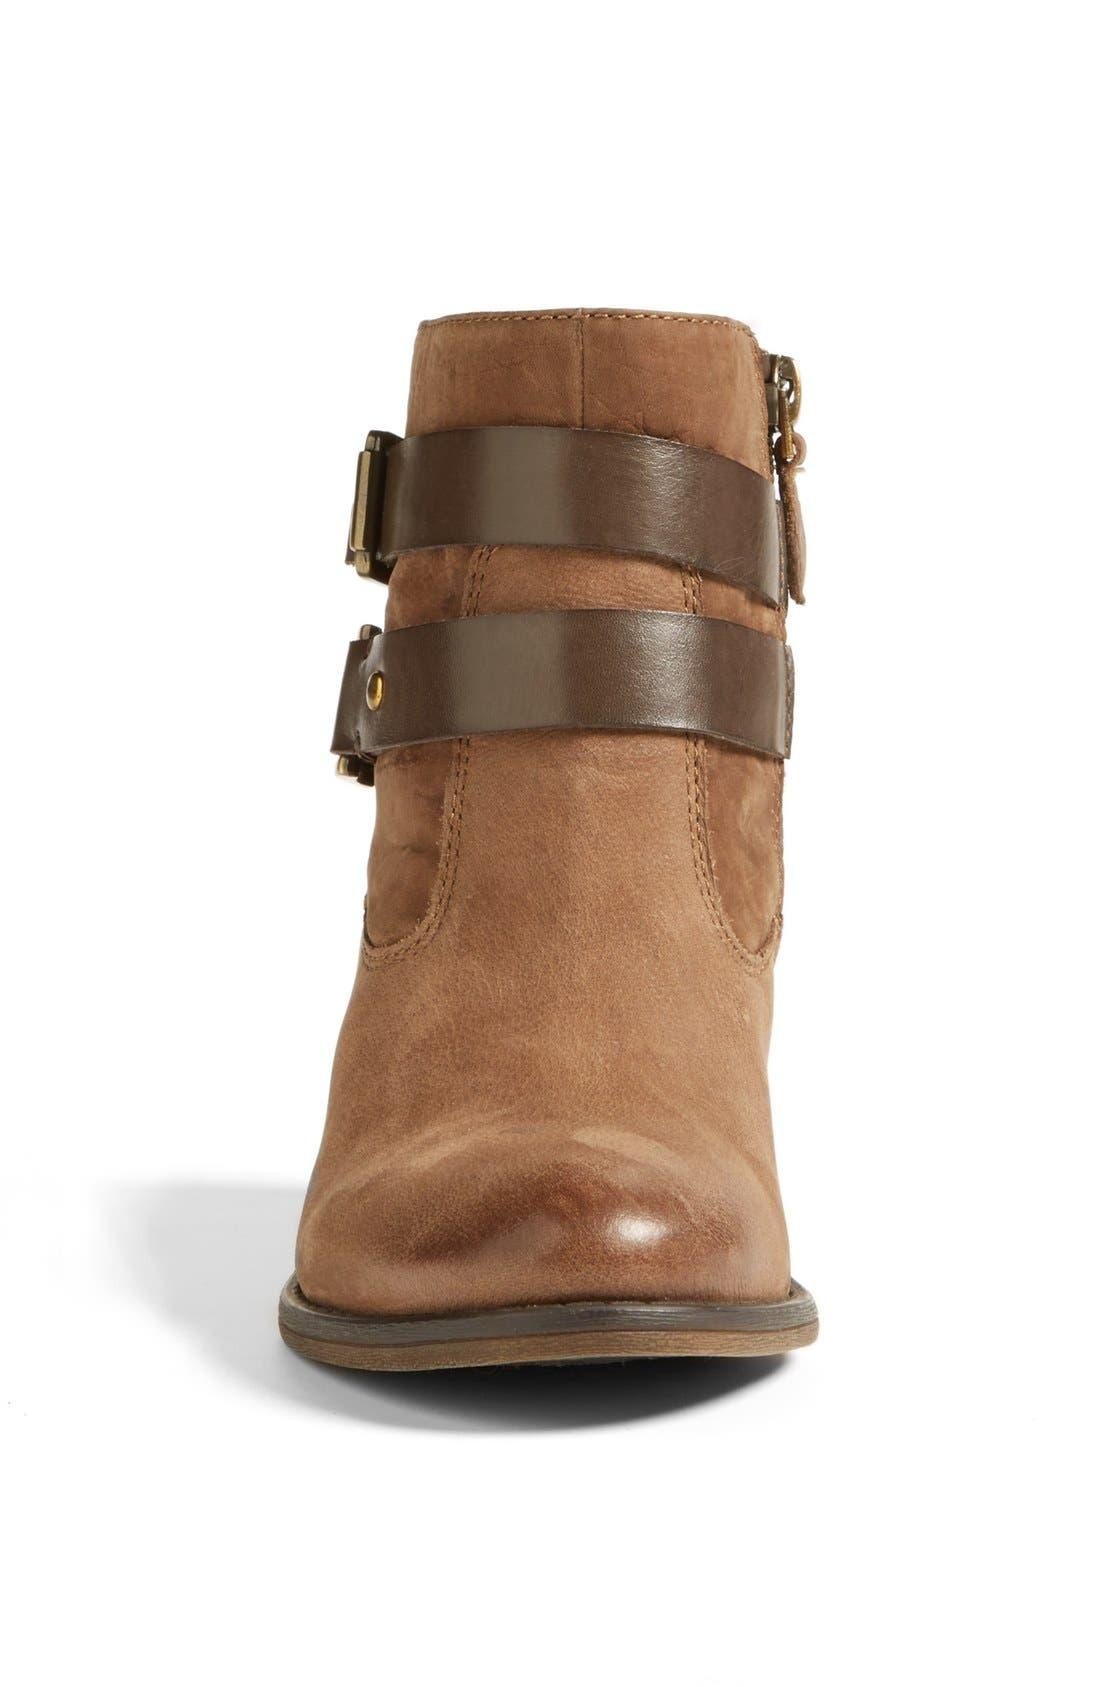 Alternate Image 3  - Franco Sarto 'Linden' Leather Bootie (Women) (Nordstrom Exclusive)